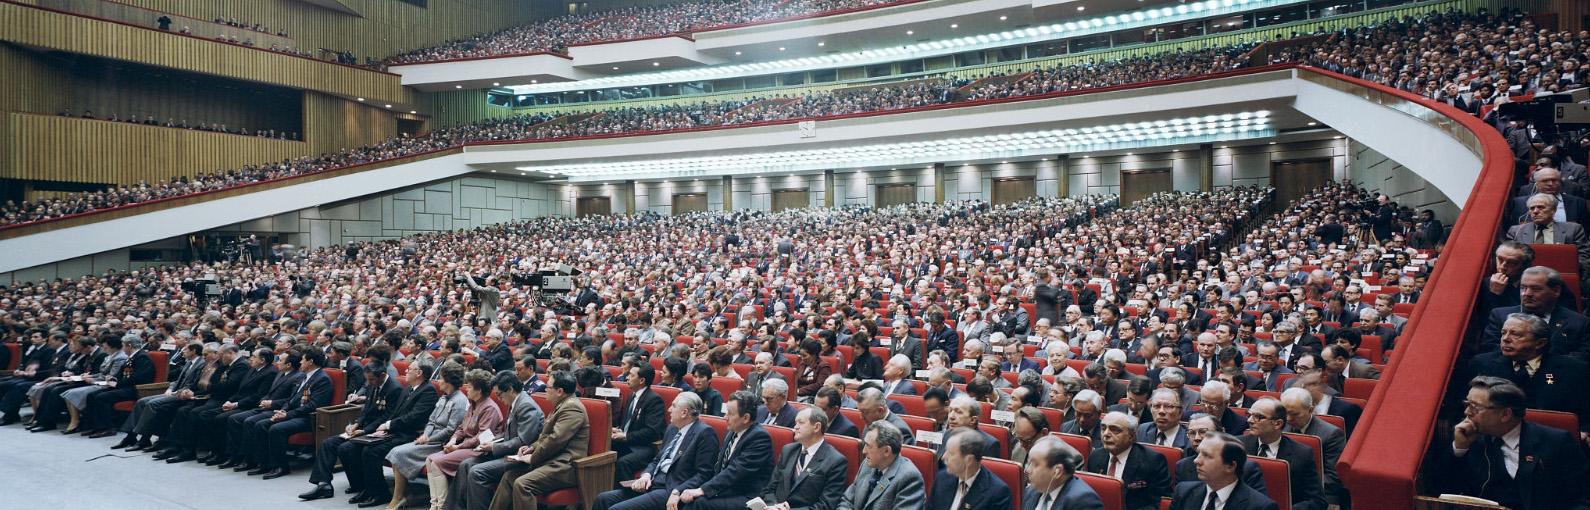 XXVII съезд КПСС (1986 год) — Кремлёвский дворец съездов